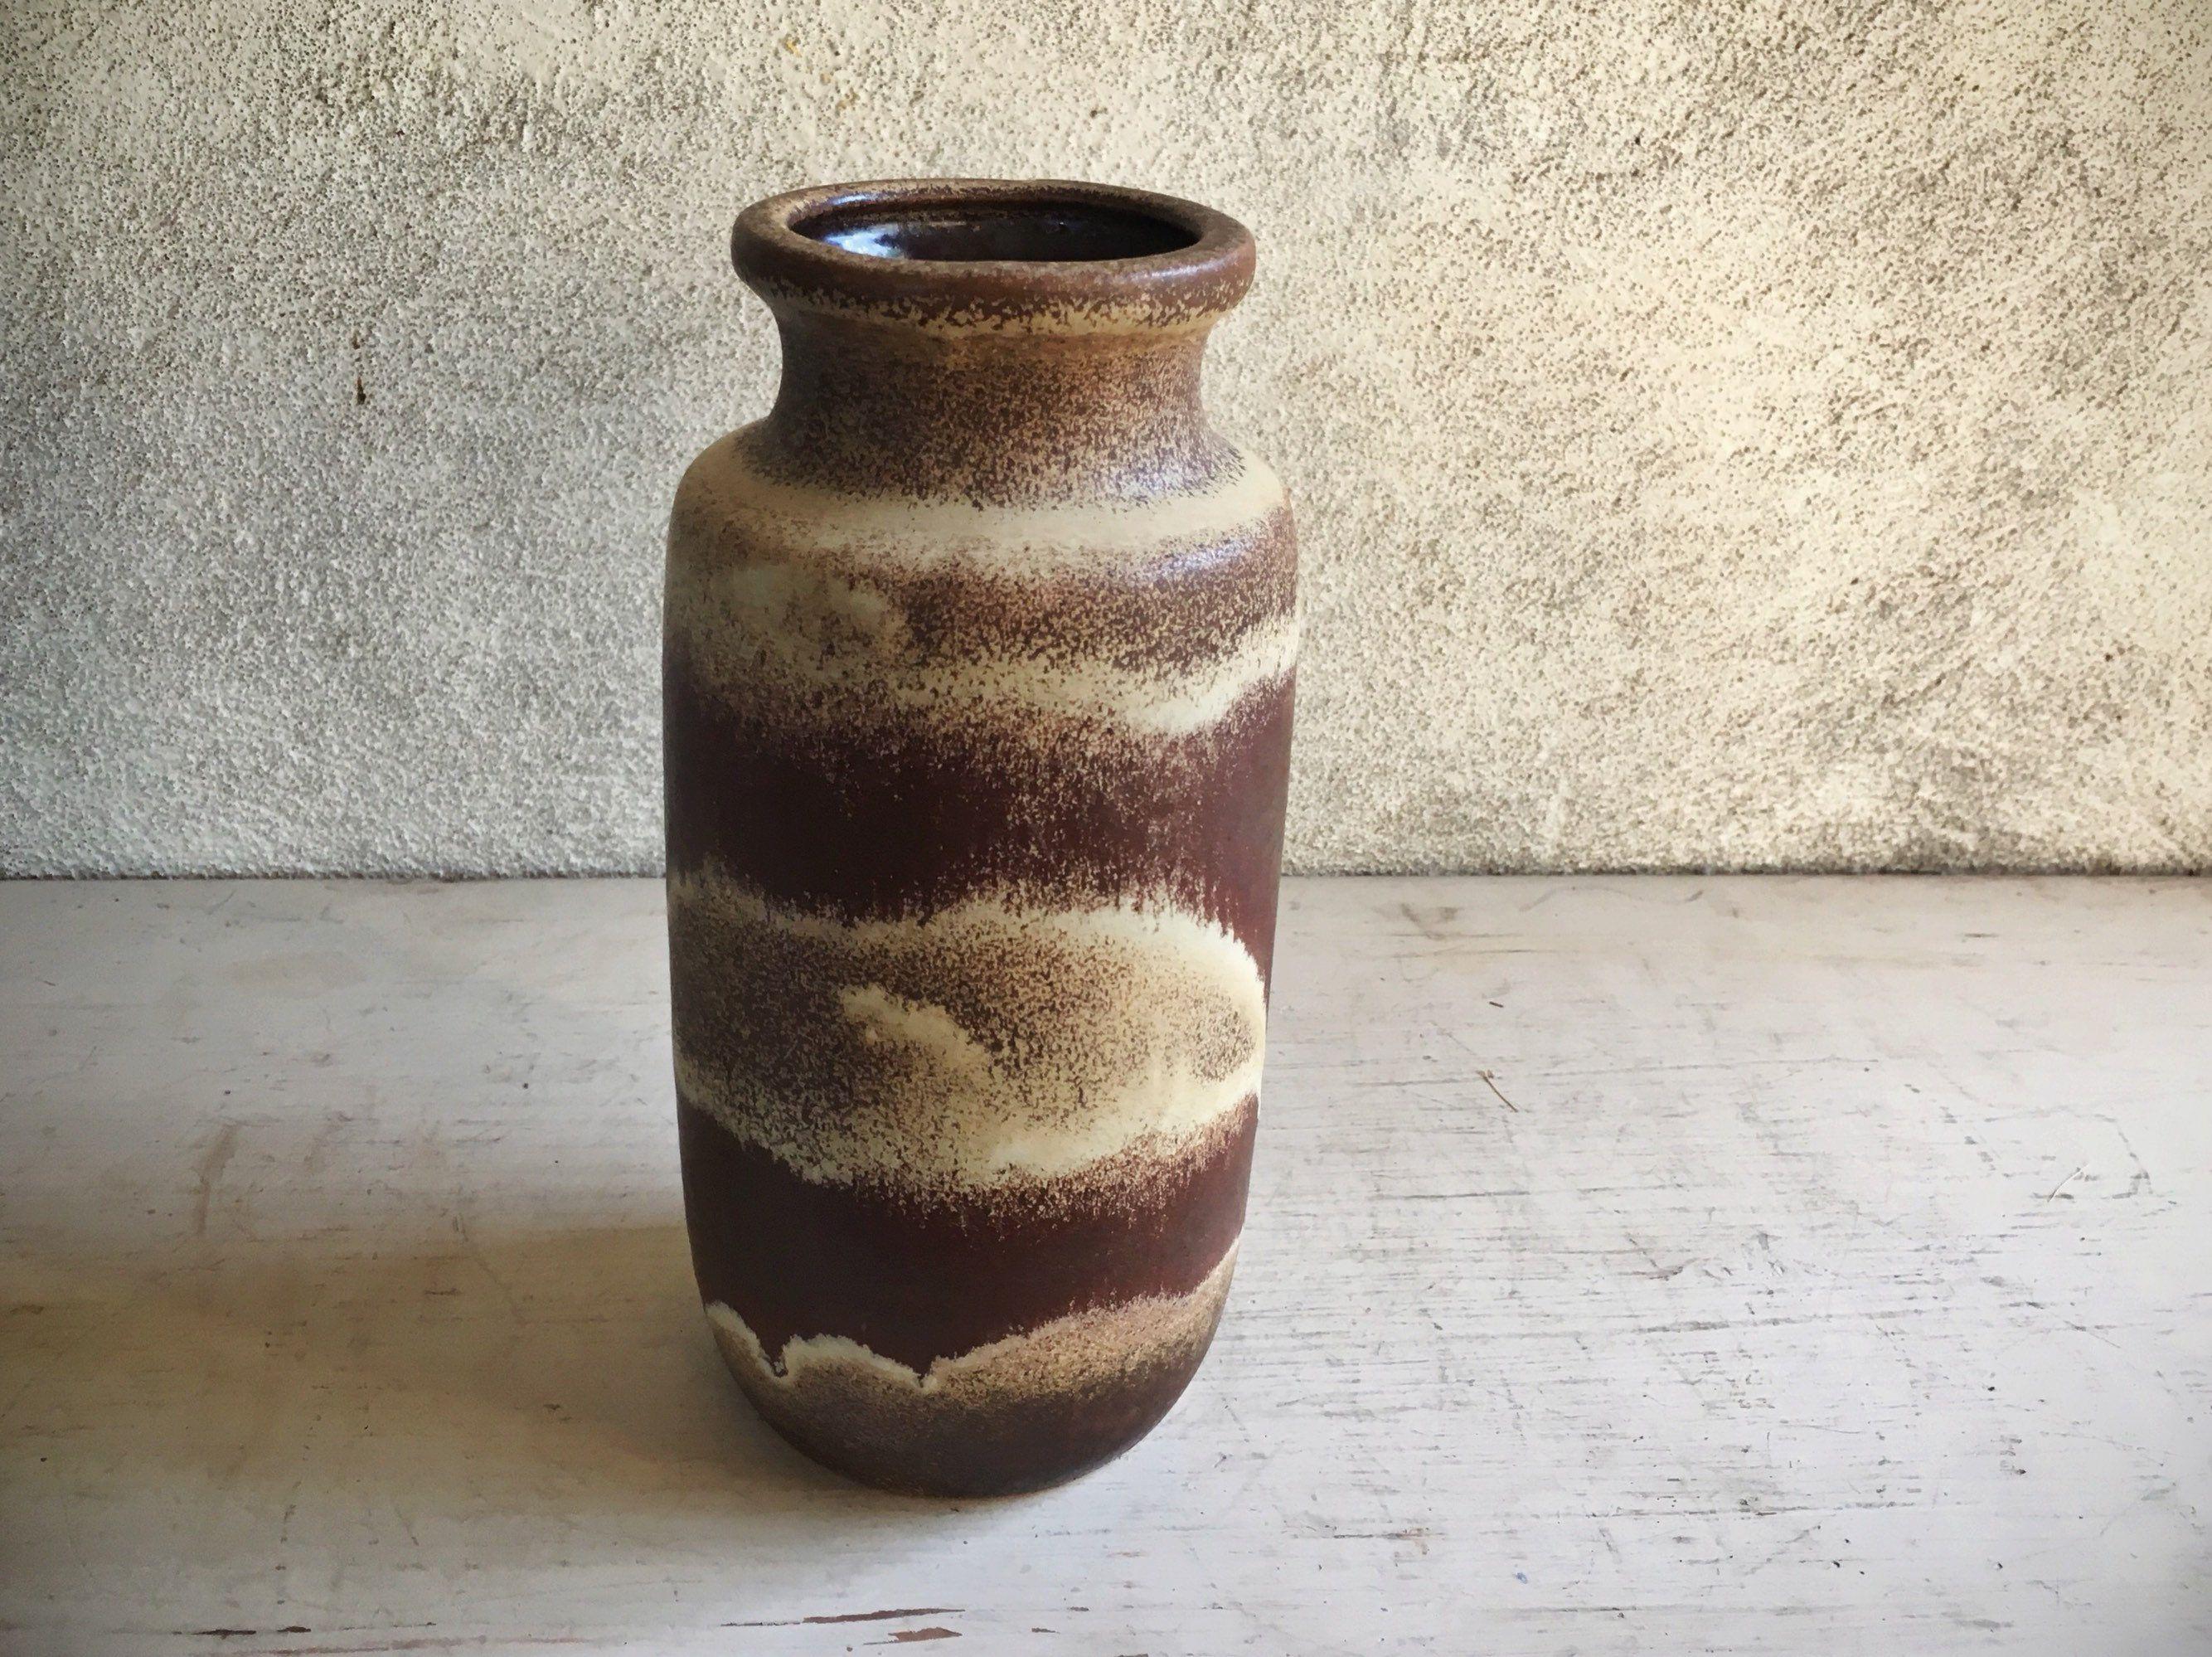 white vases hobby lobby of 26 vase market coupon the weekly world pertaining to mid century pottery west germany vase 213 20 scheurich keramik vase